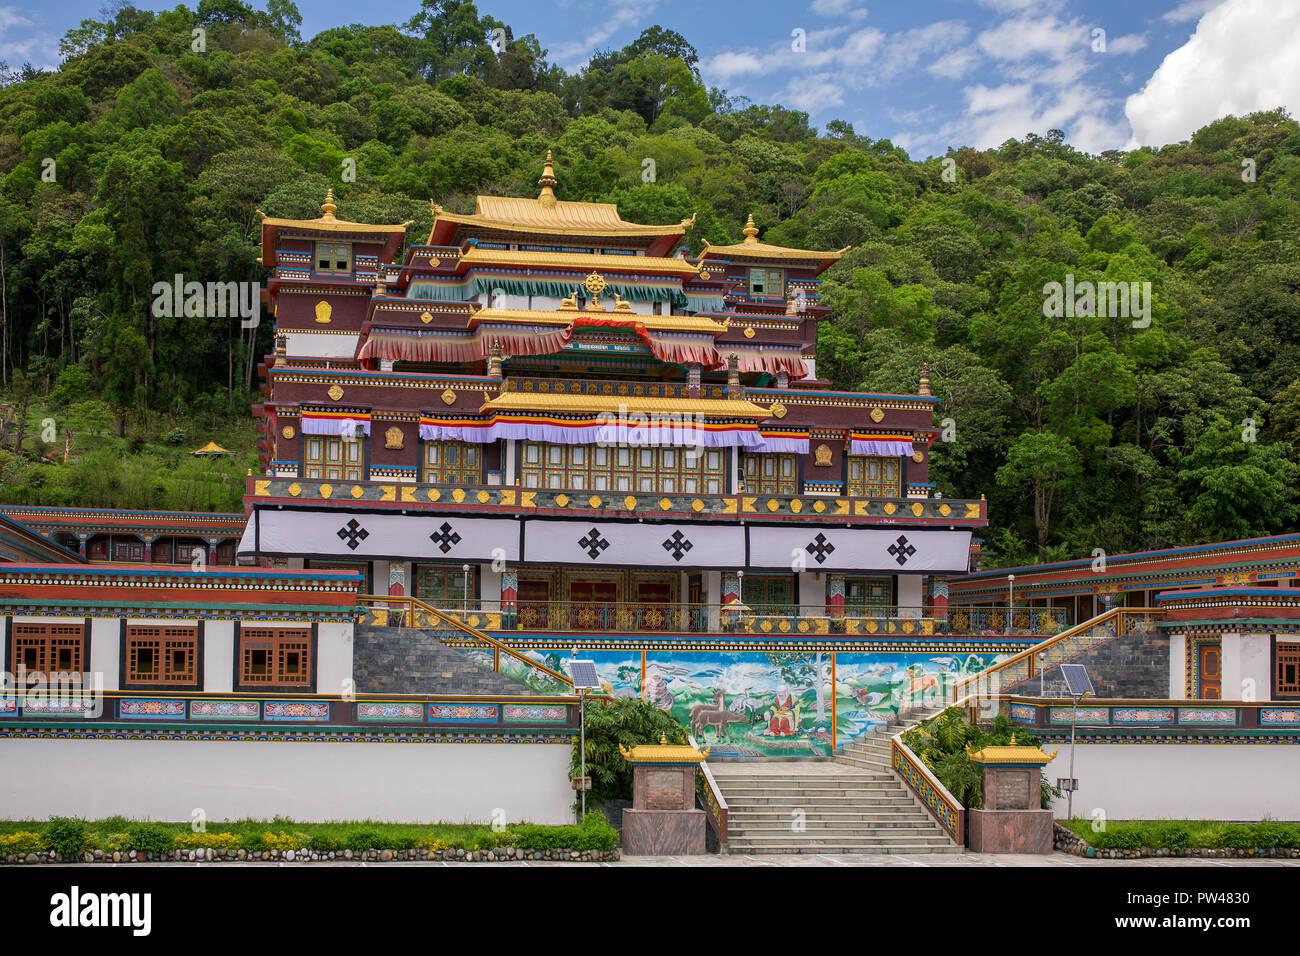 Ranka (Lingdum or Pal Zurmang Kagyud) Monastery in Gangtok. - Stock Image